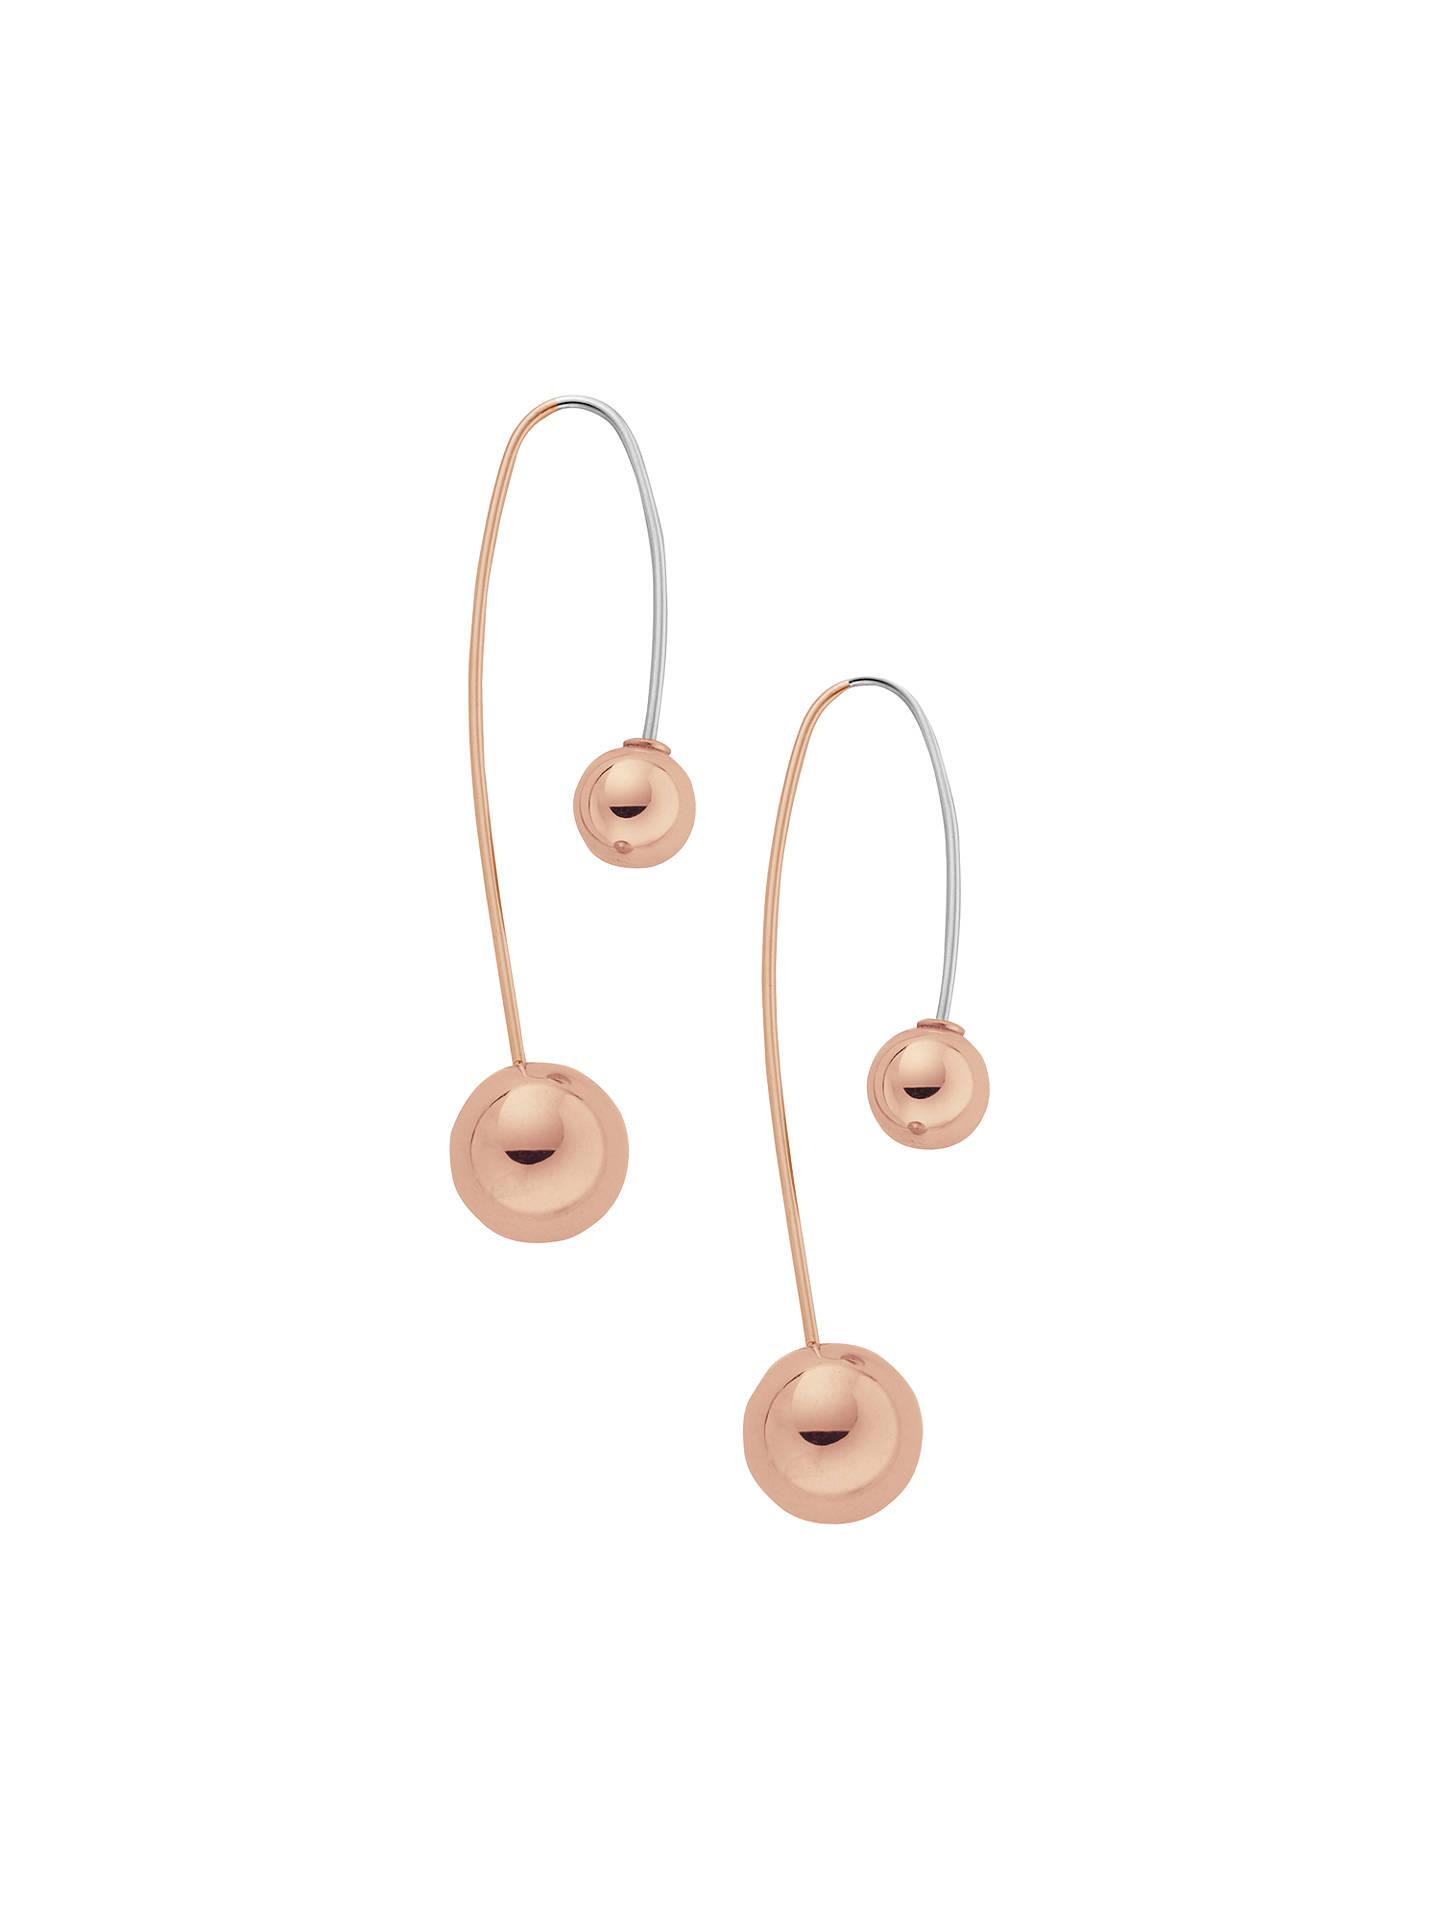 2c7a7e720 Buy Skagen Elin Bead Drop Earrings, Rose Gold Online at johnlewis.com